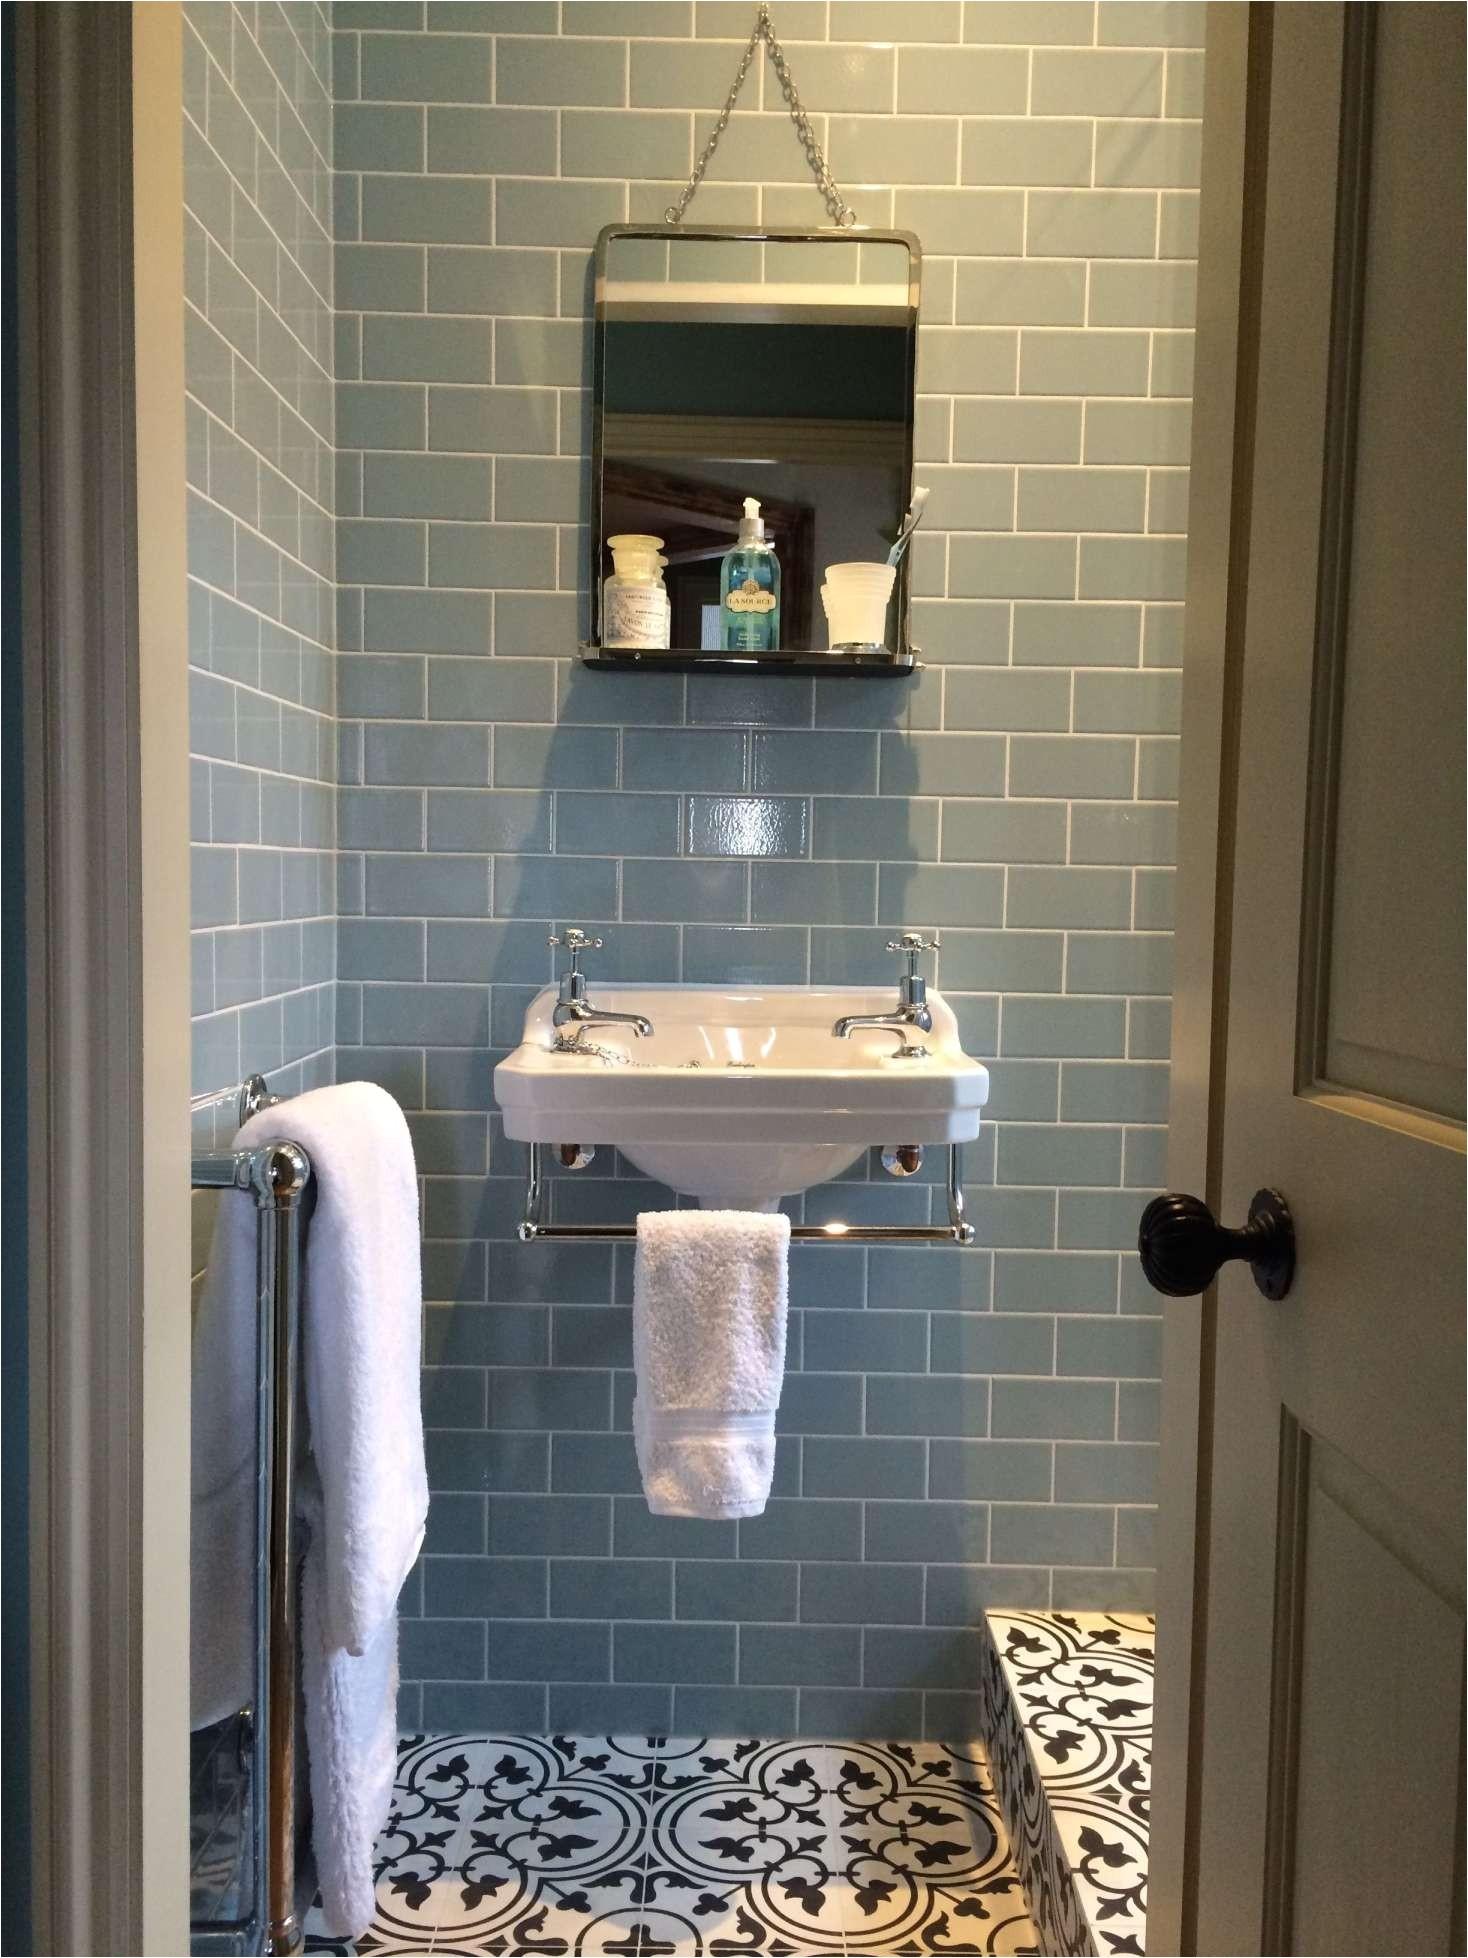 Bathroom Design Ideas Tile Bathroom Floor Tile Design Ideas New Floor Tiles Mosaic Bathroom 0d